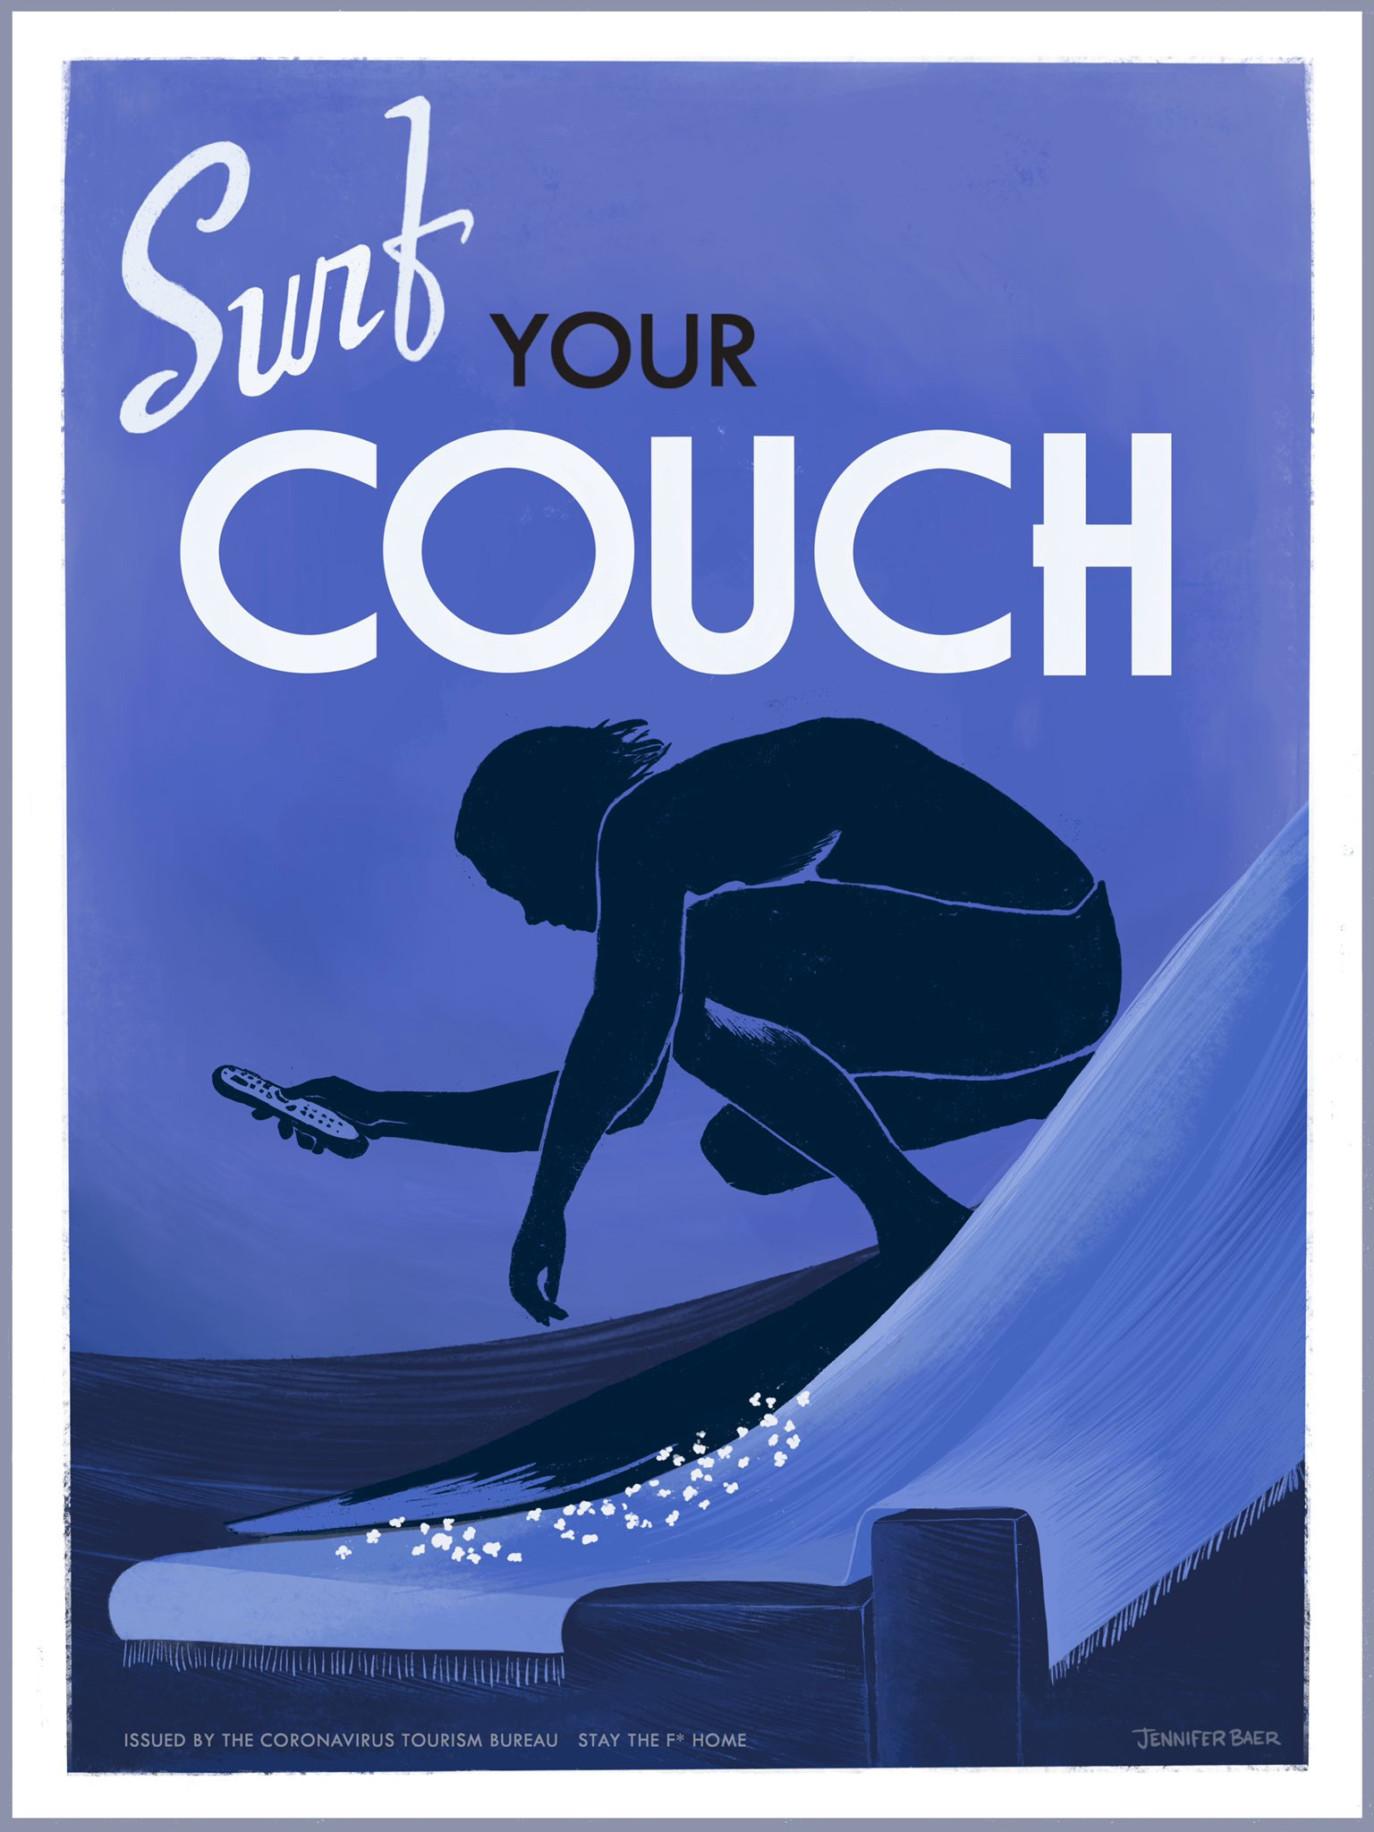 Jennifer Baer - Coronavirus Tourist Office Posters